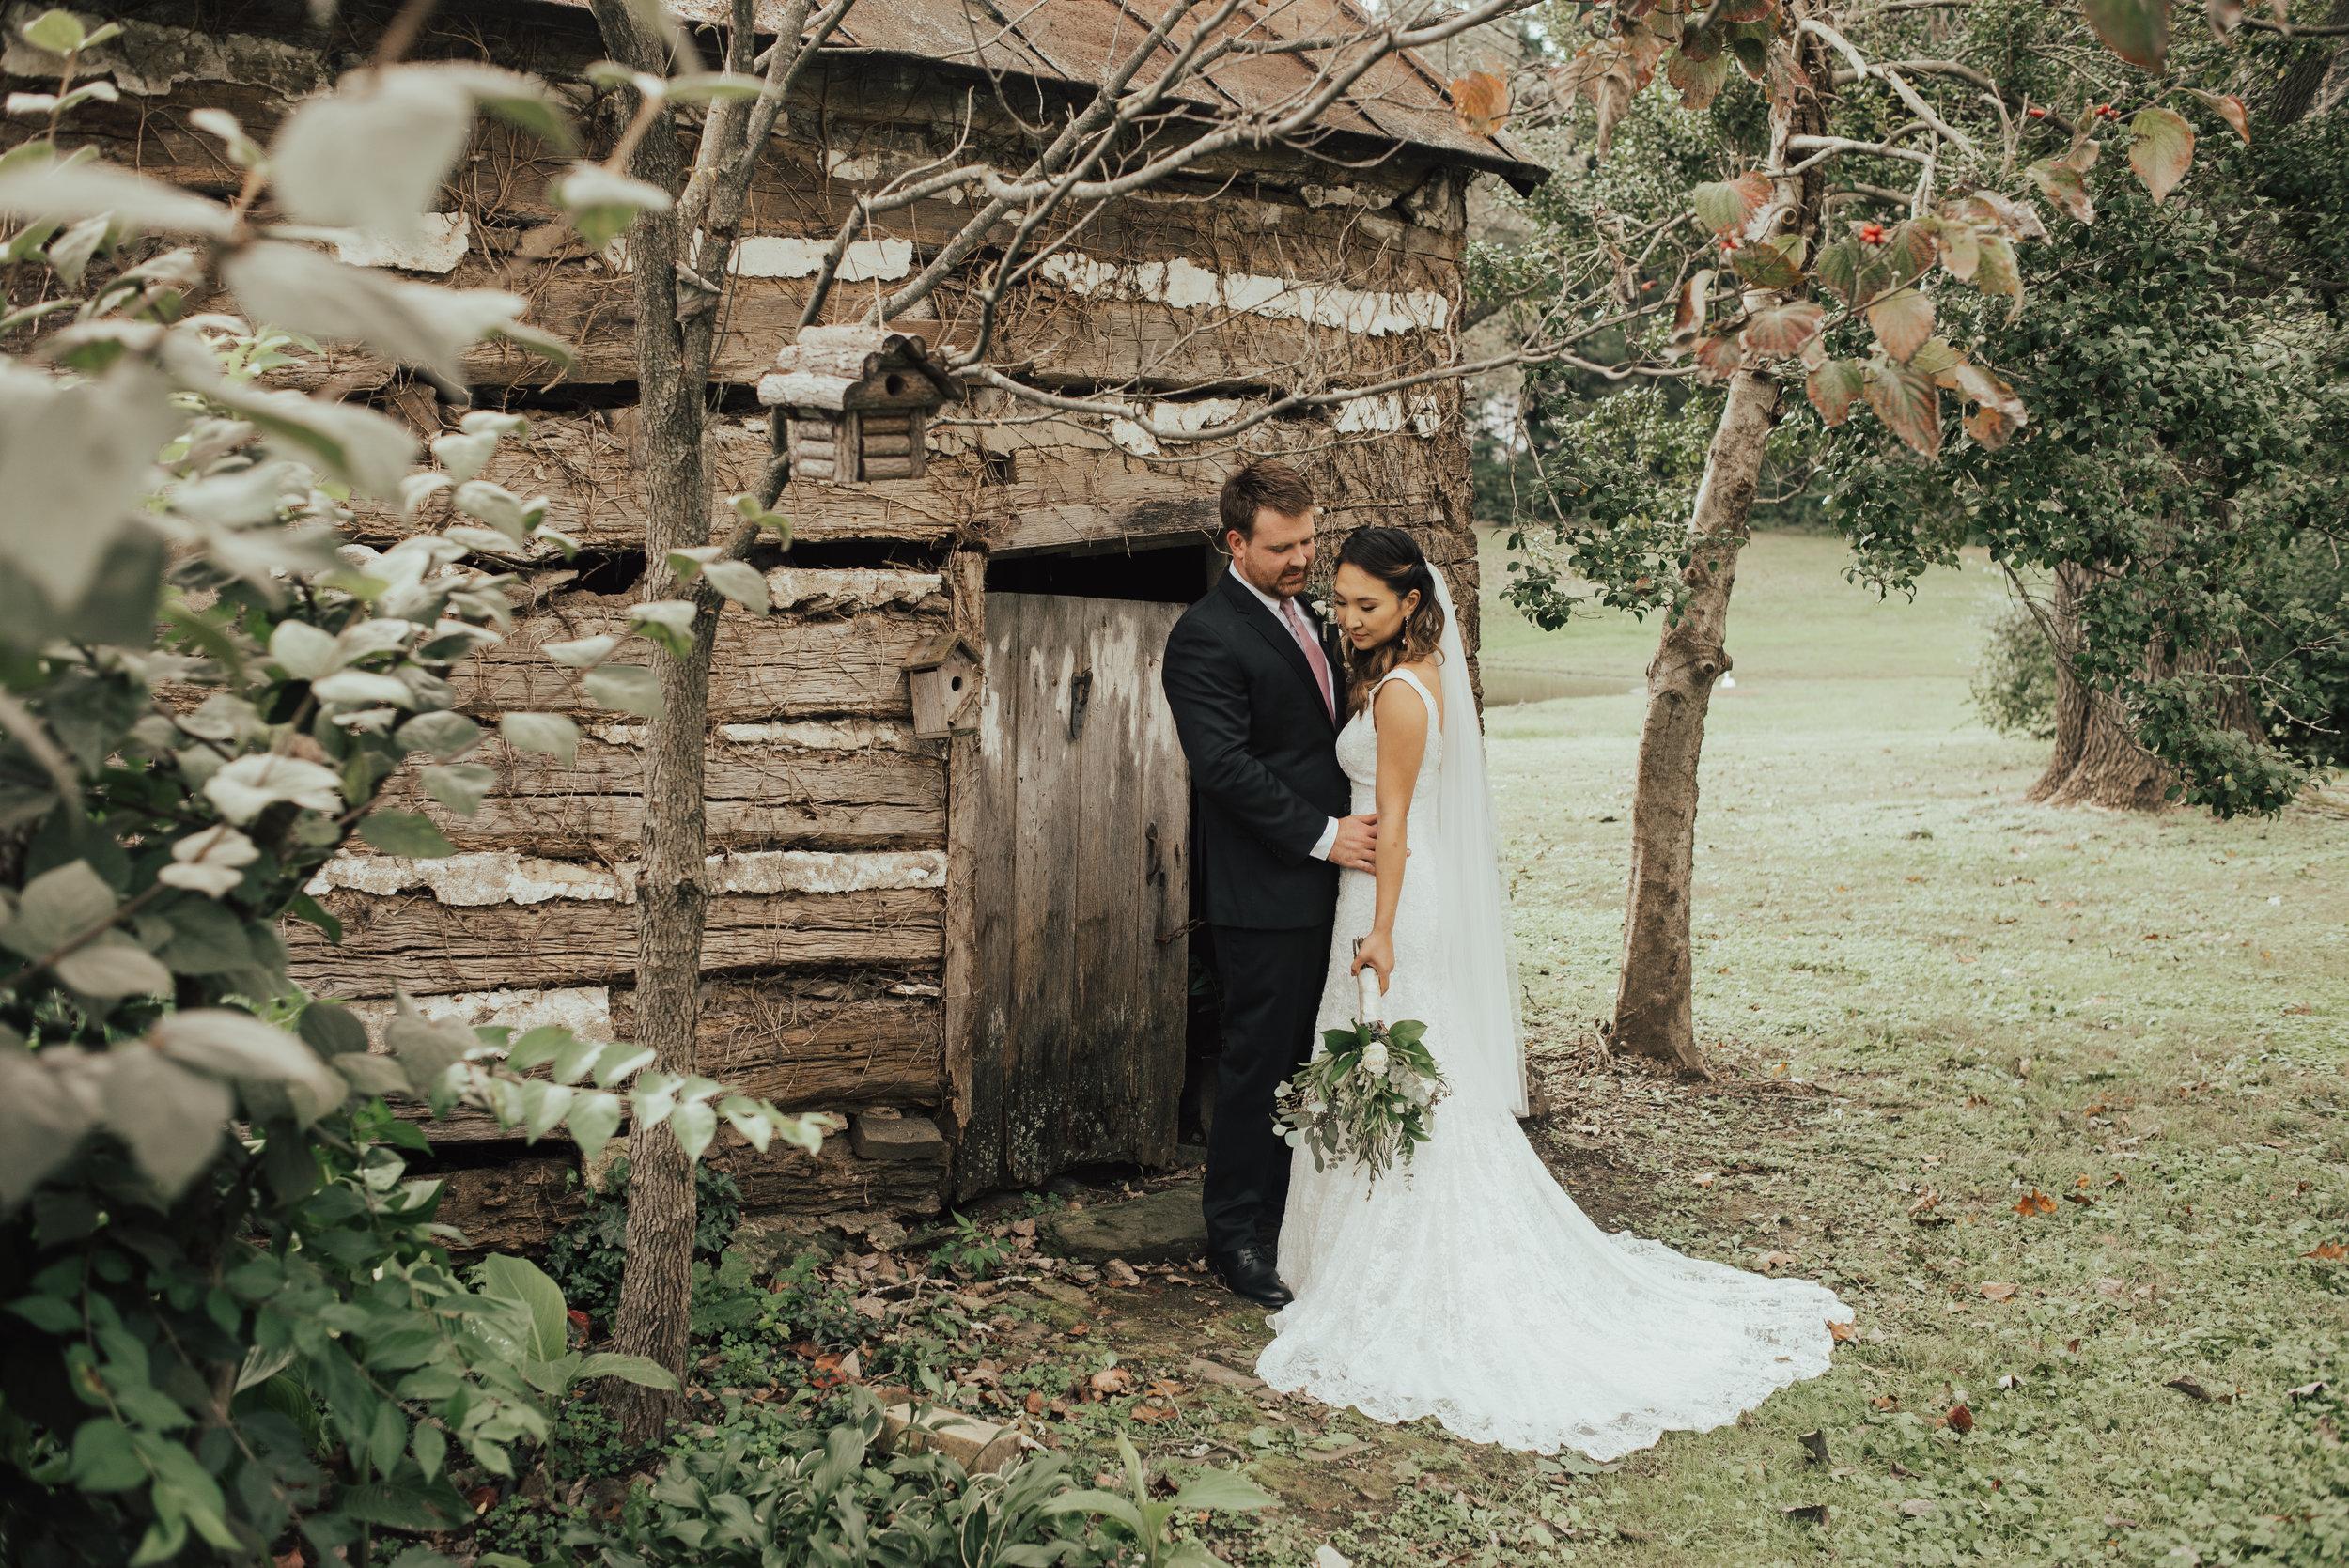 Sylvanside Farm Winter Wedding By SB Photographs171717017001717170171717171717295295295017000171717017.jpg